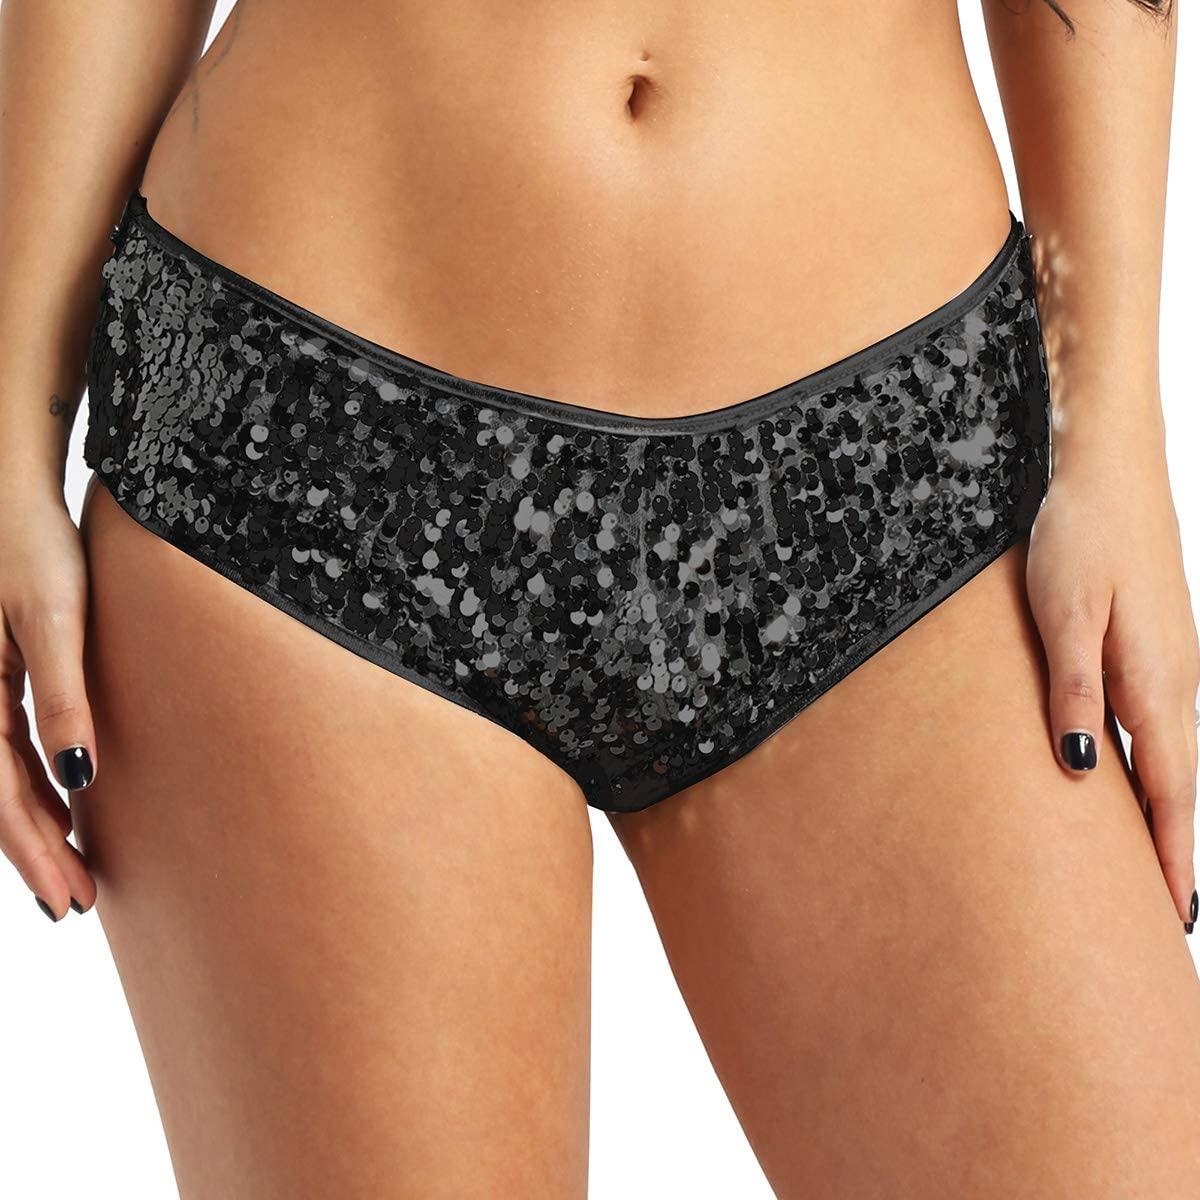 Agoky Women's Glittery Sequins Metallic Booty Shorts Rave Dance Bottoms Club Wear